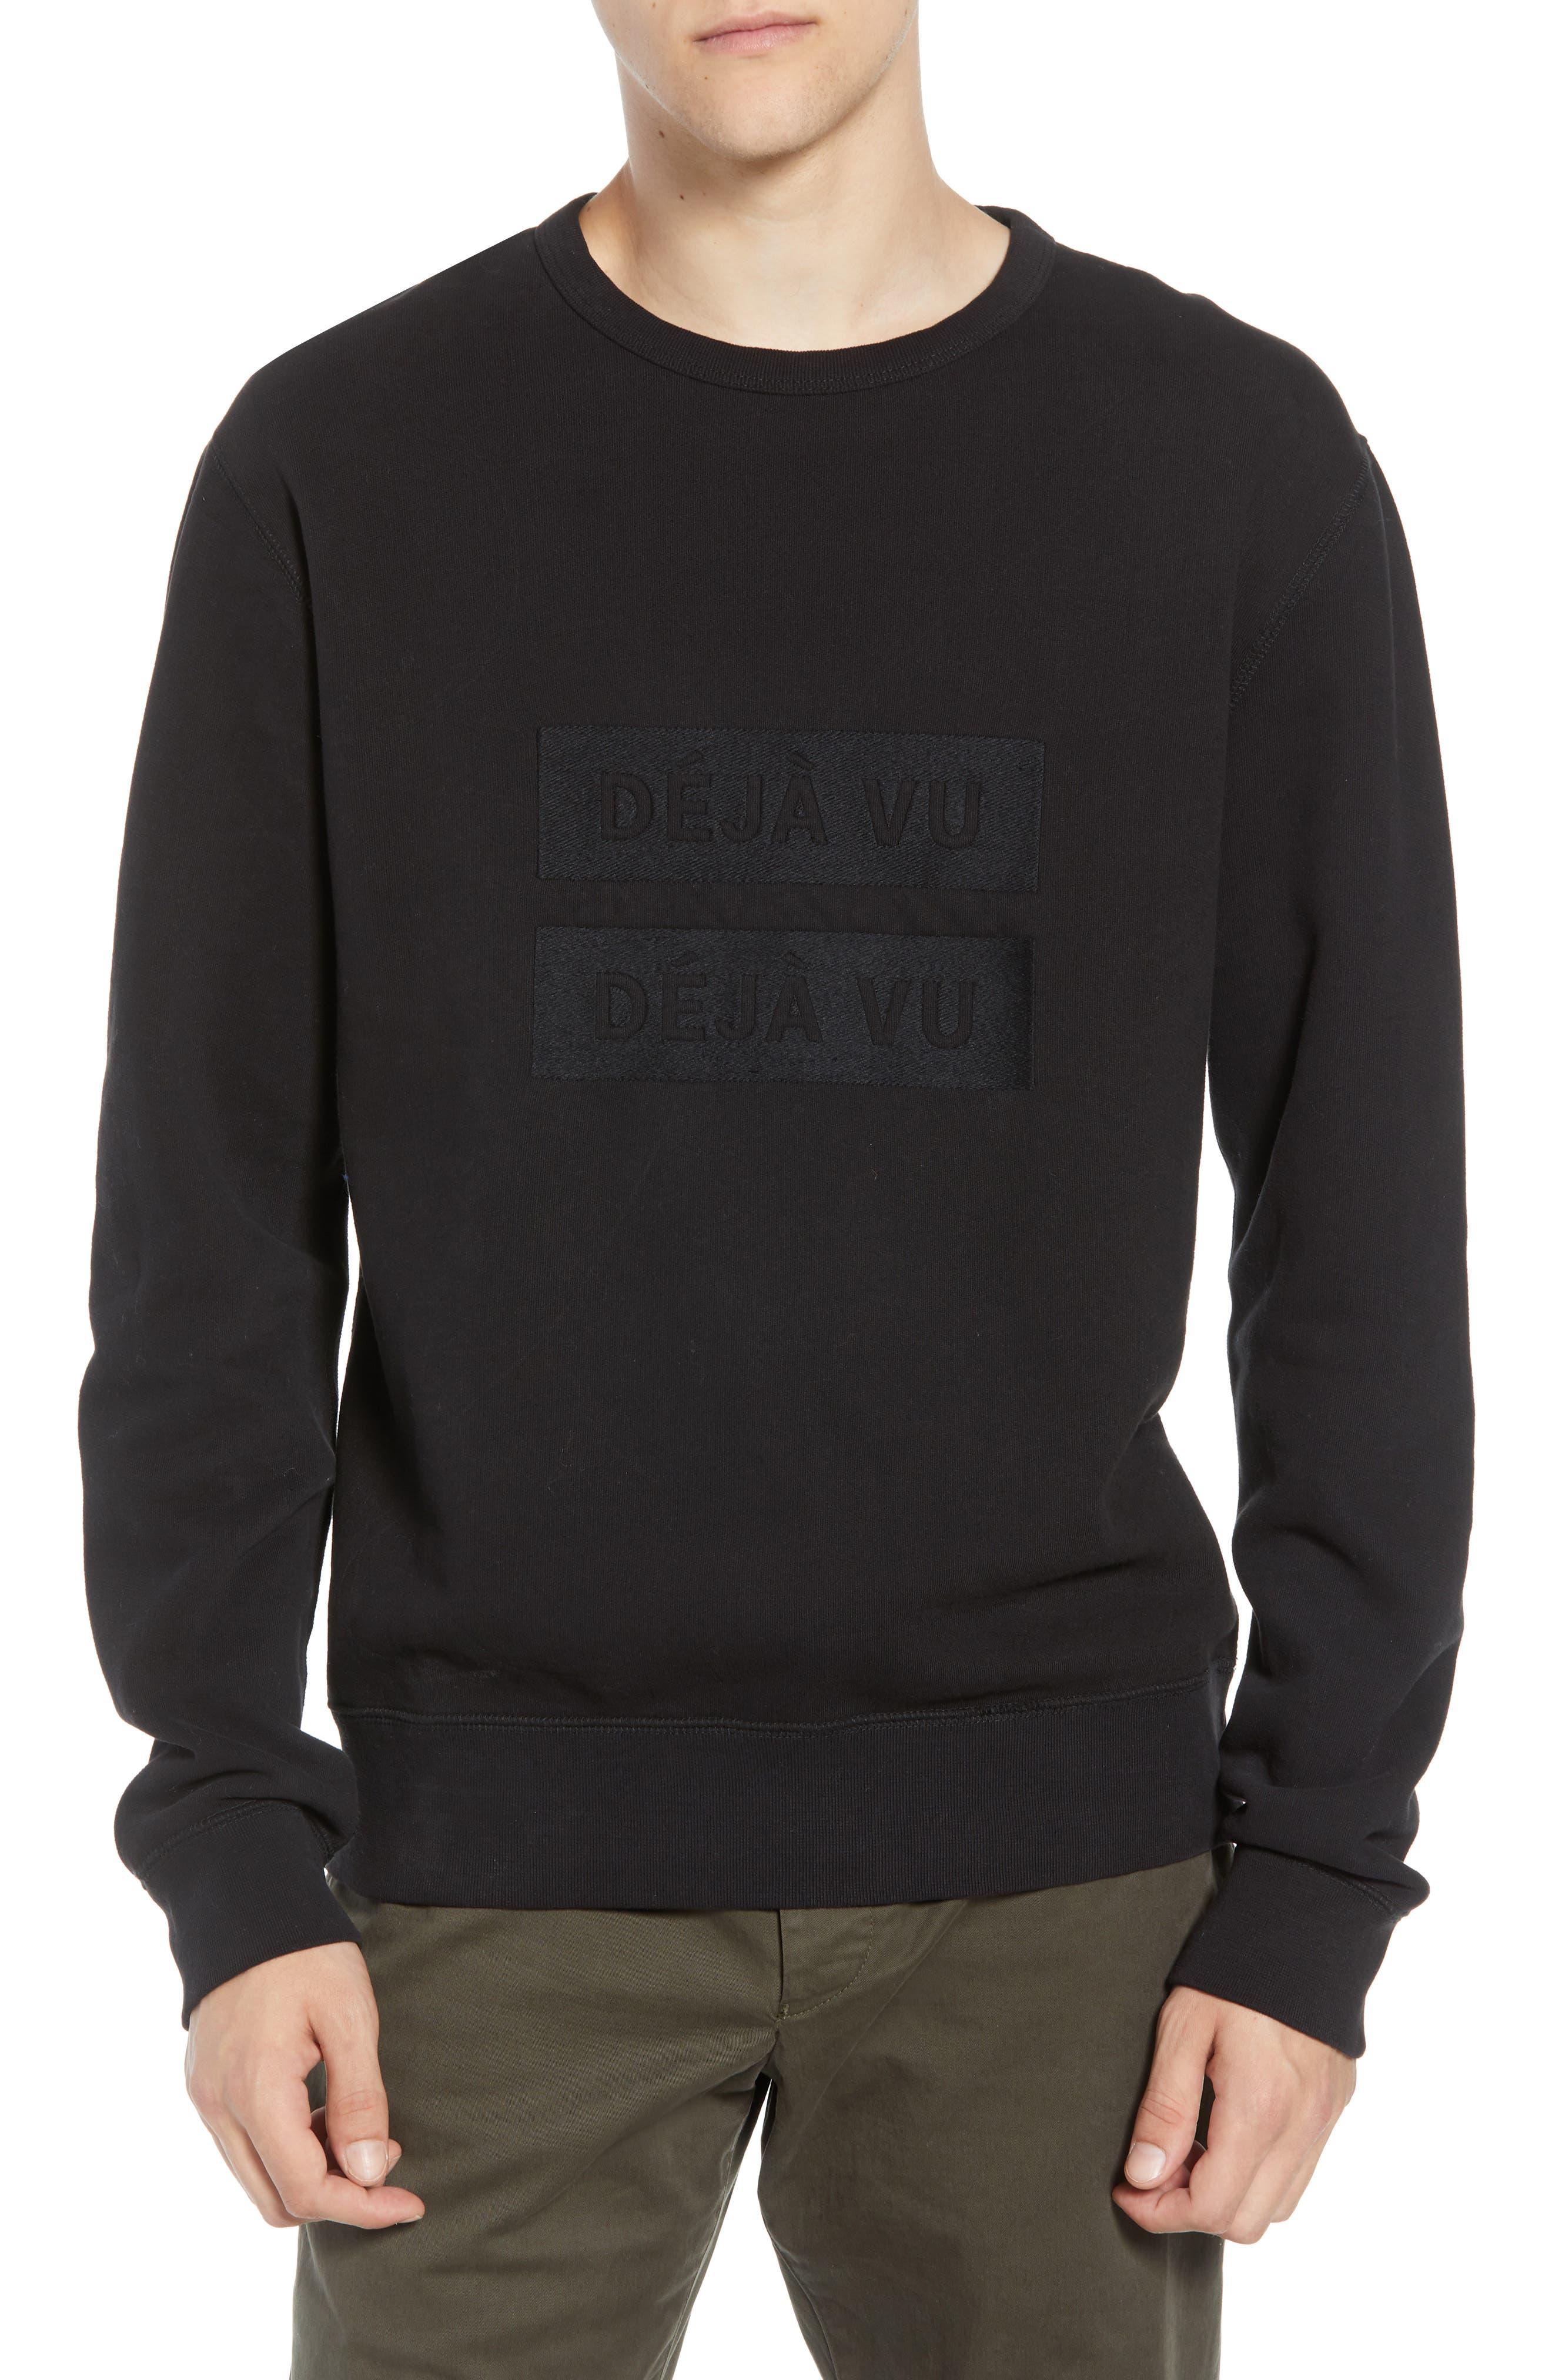 Déjà Vu Sweatshirt,                         Main,                         color, BLACK BLACK